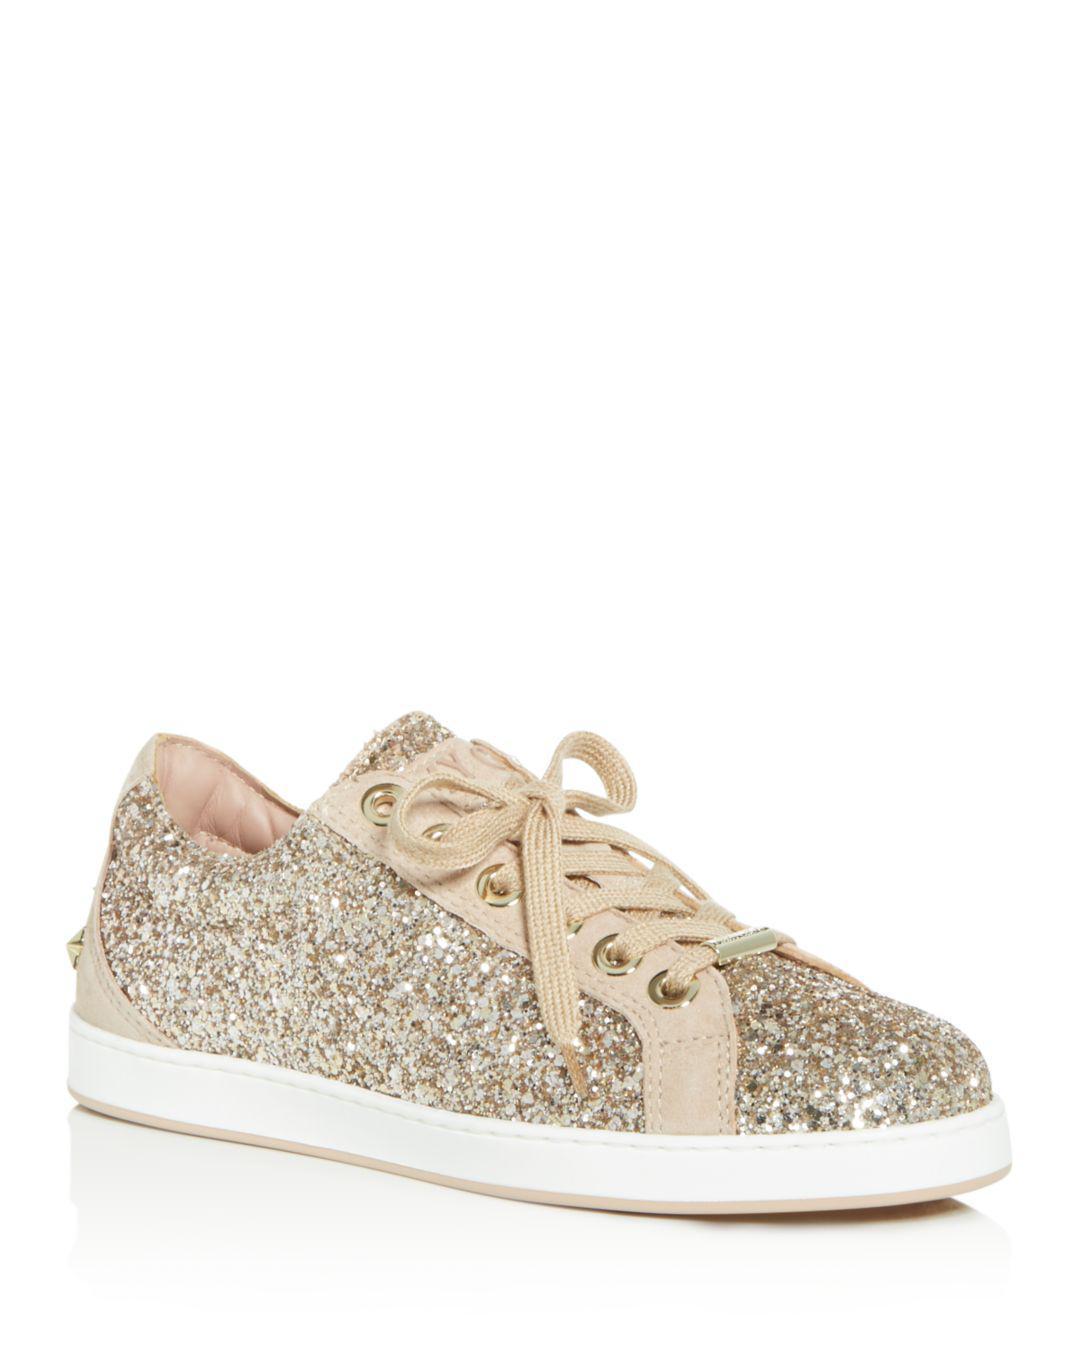 f793e673eb54 Lyst - Jimmy Choo Women s Cash Glitter Lace Up Sneakers in Pink